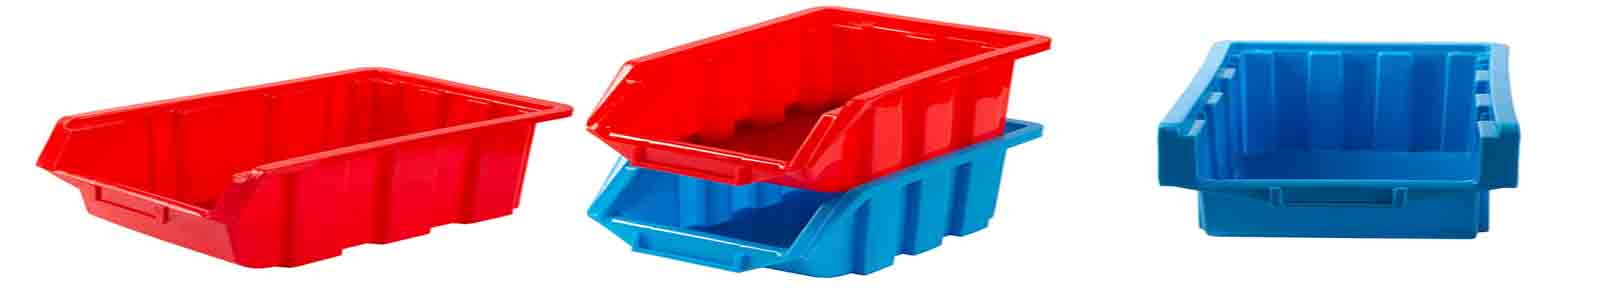 پالت پلاستیکی کشویی